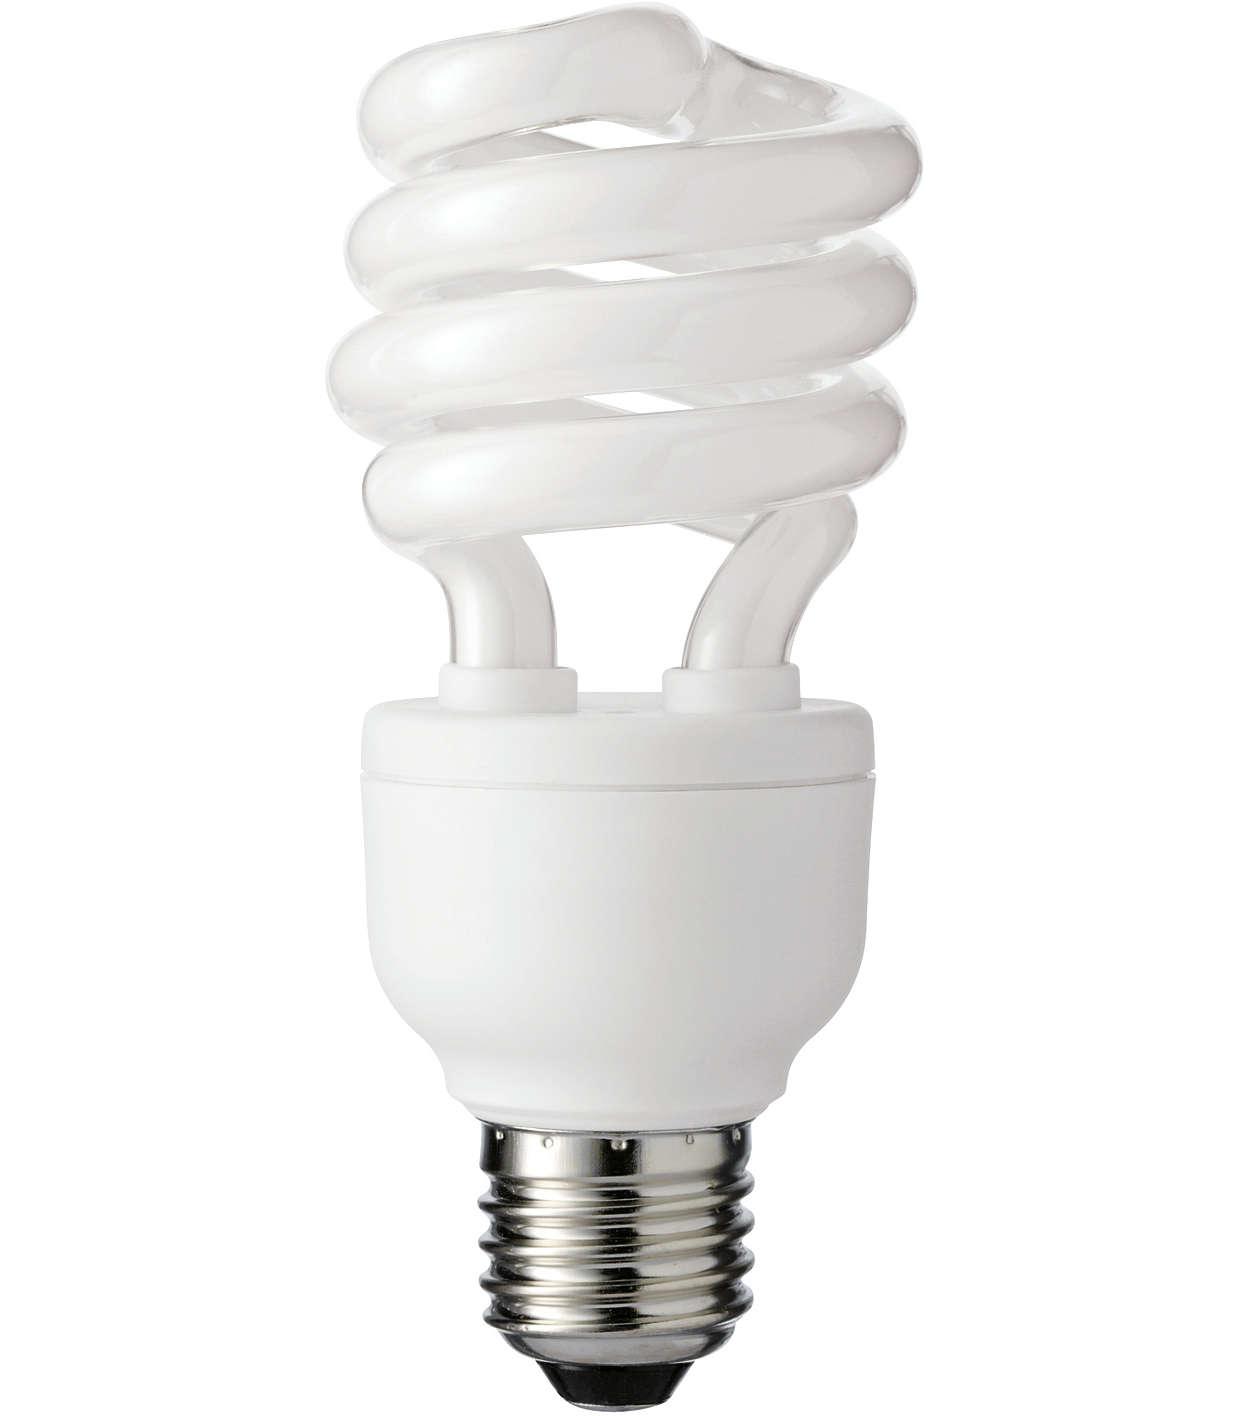 Decorative spiral-shaped energy-saving lamp